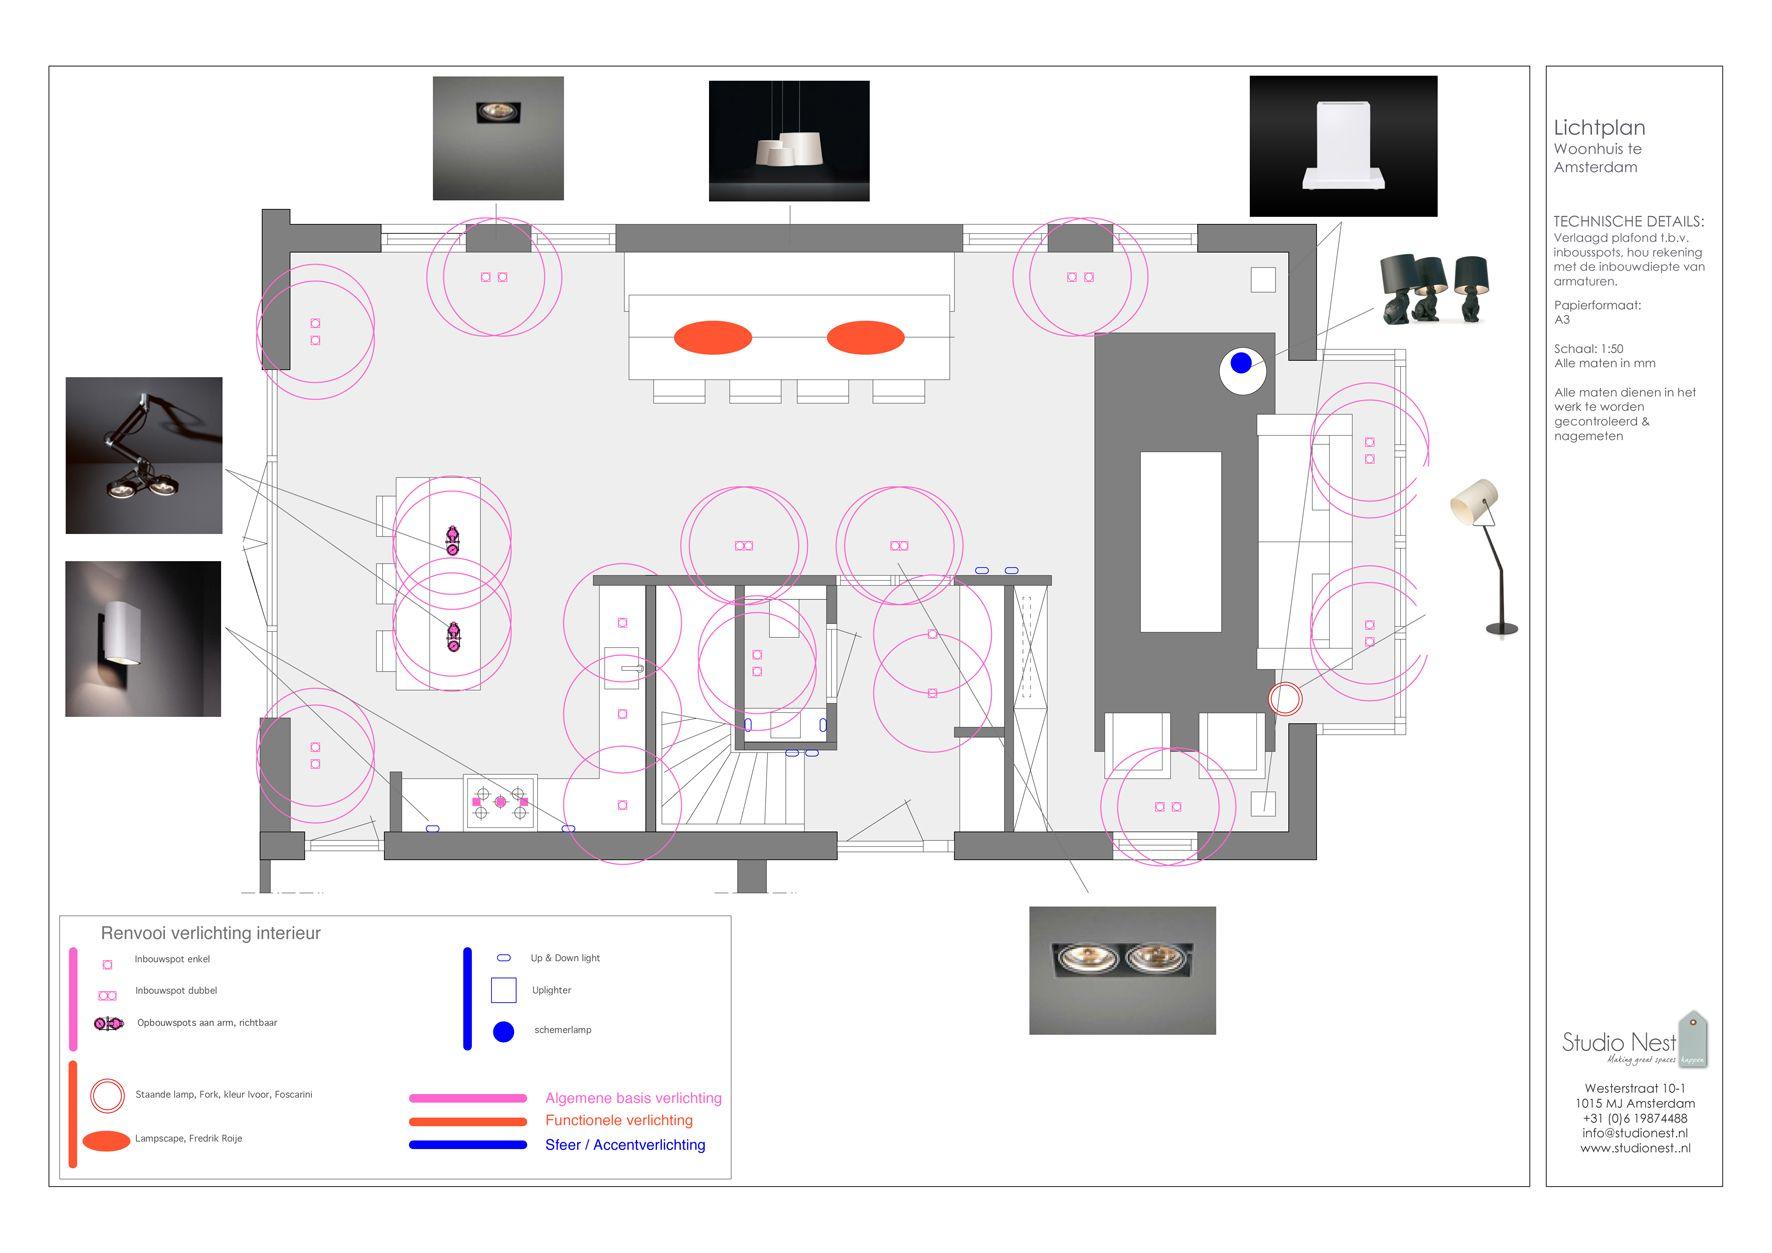 Lichtplan lichtadvies © Studio Nest | Architecture models & drawings ...